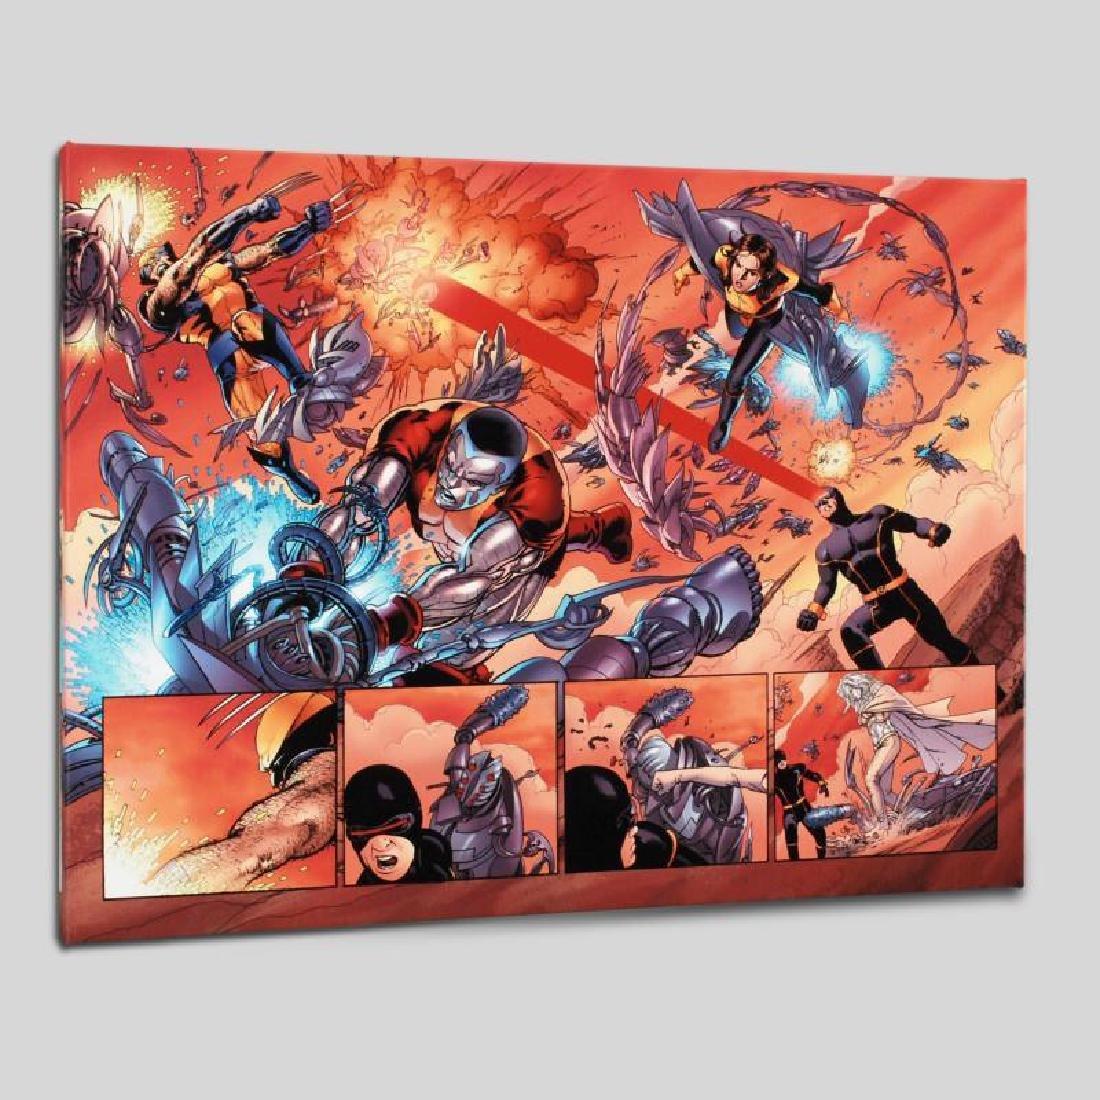 Astonishing X-Men N12 by Marvel Comics - 3